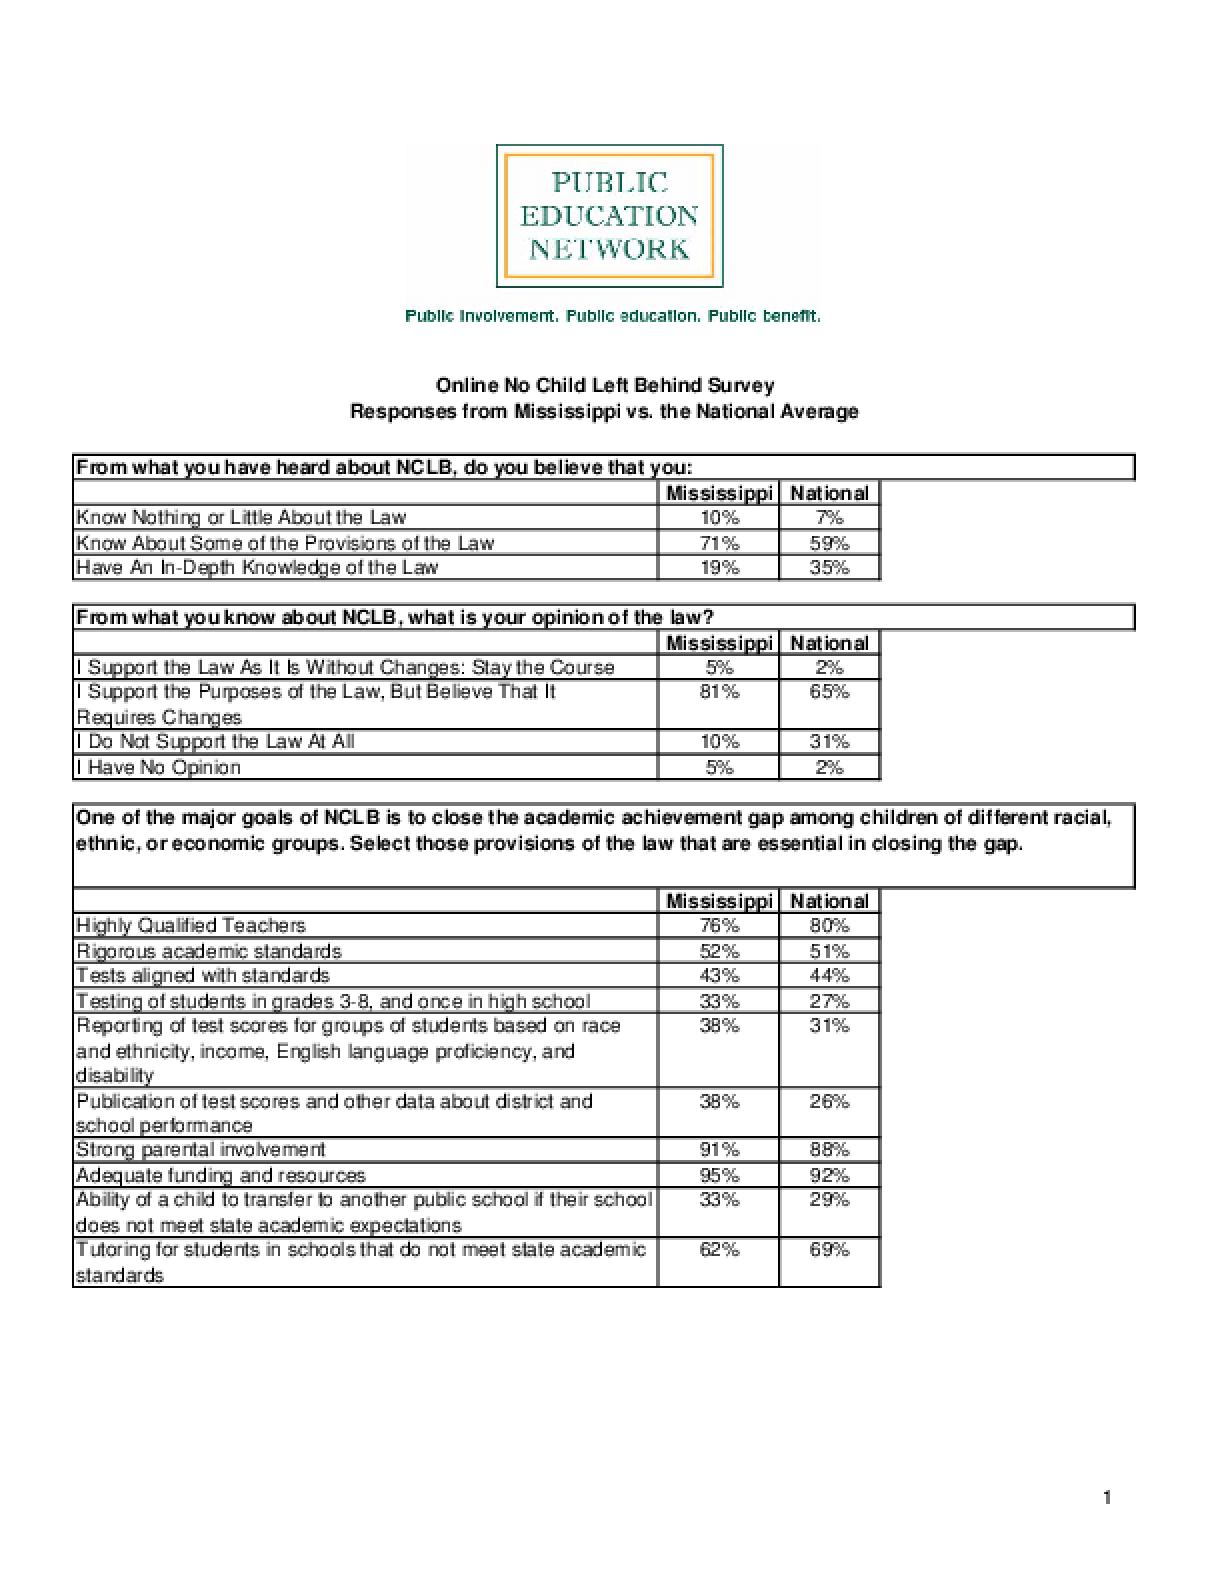 Online No Child Left Behind Survey Responses from Mississippi vs. the National Average